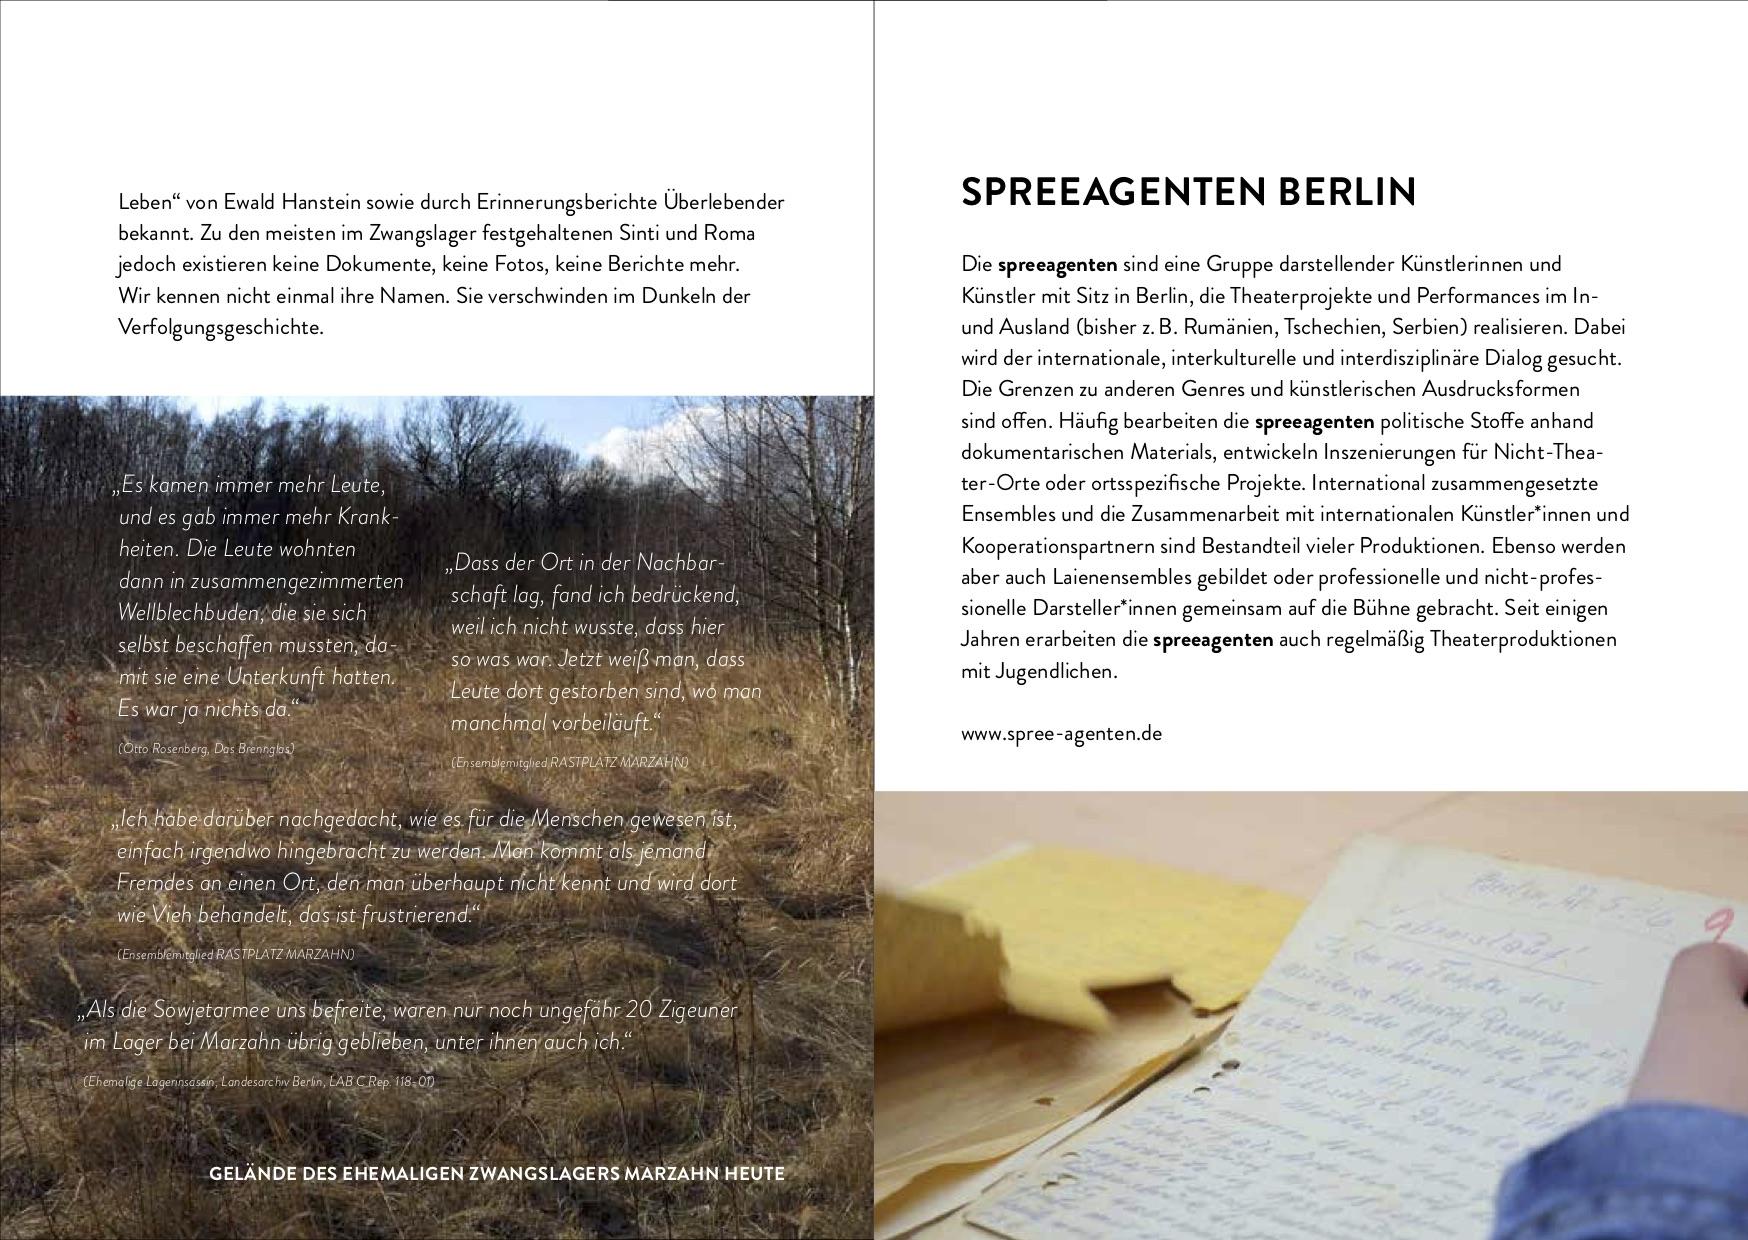 Doku-Broschüre_spreeagenten_RAM_Bro_28-Seiter_A5_03_15.12.17_S26+27.jpg